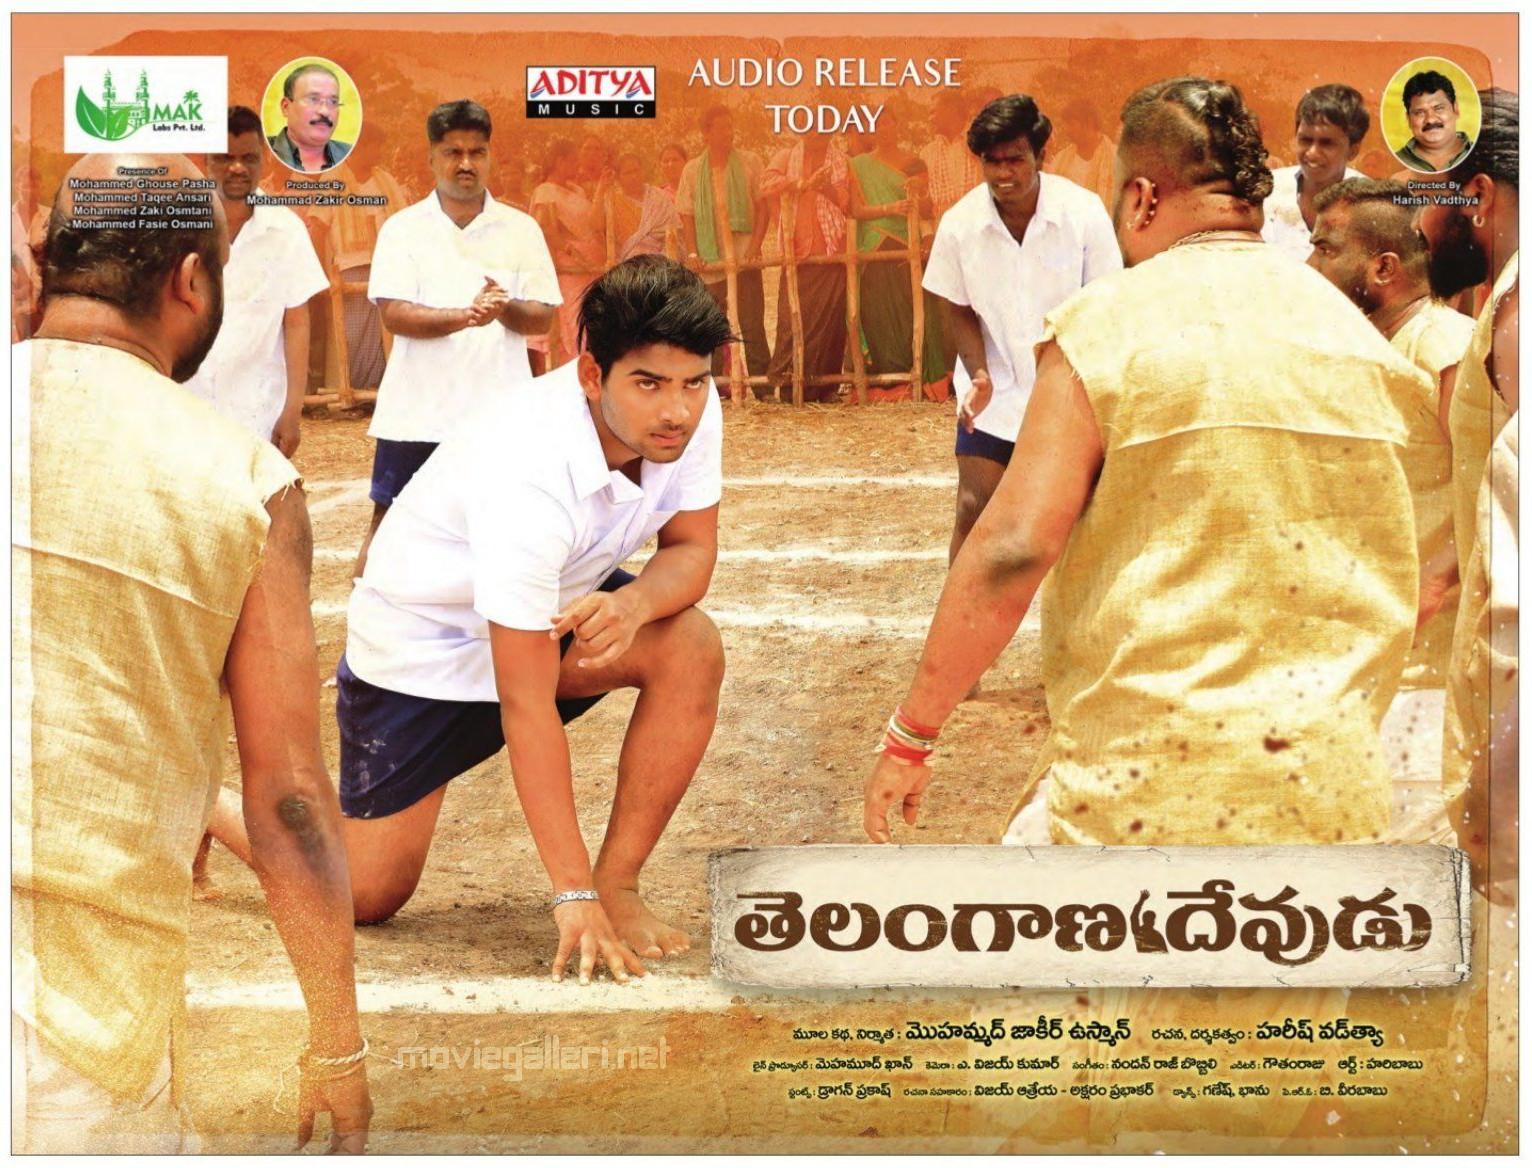 Telangana Devudu Movie Audio Release Today Posters